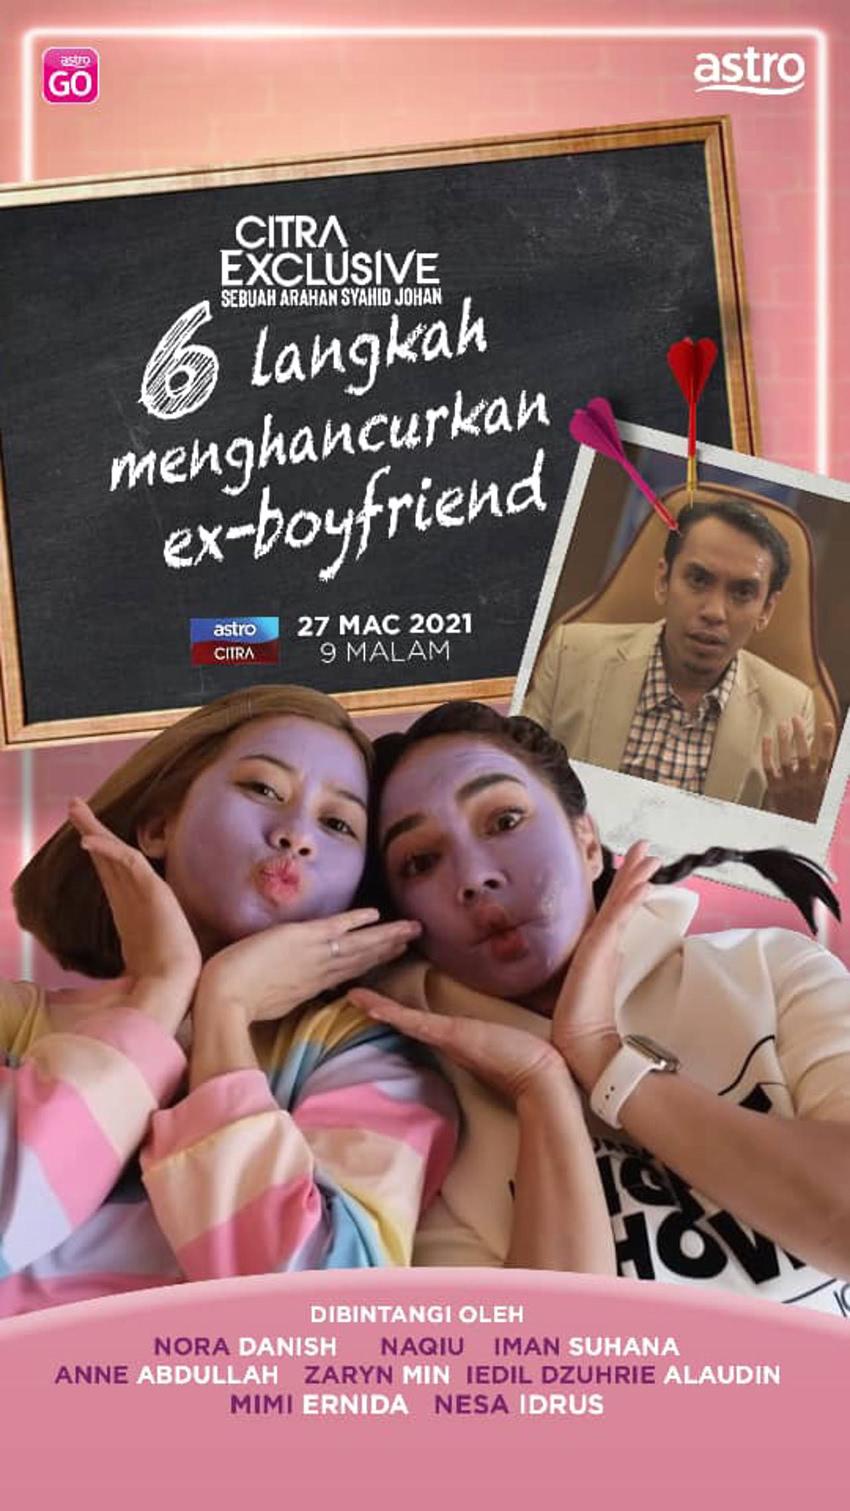 6 Langkah Menghancurkan Ex-boyfriend